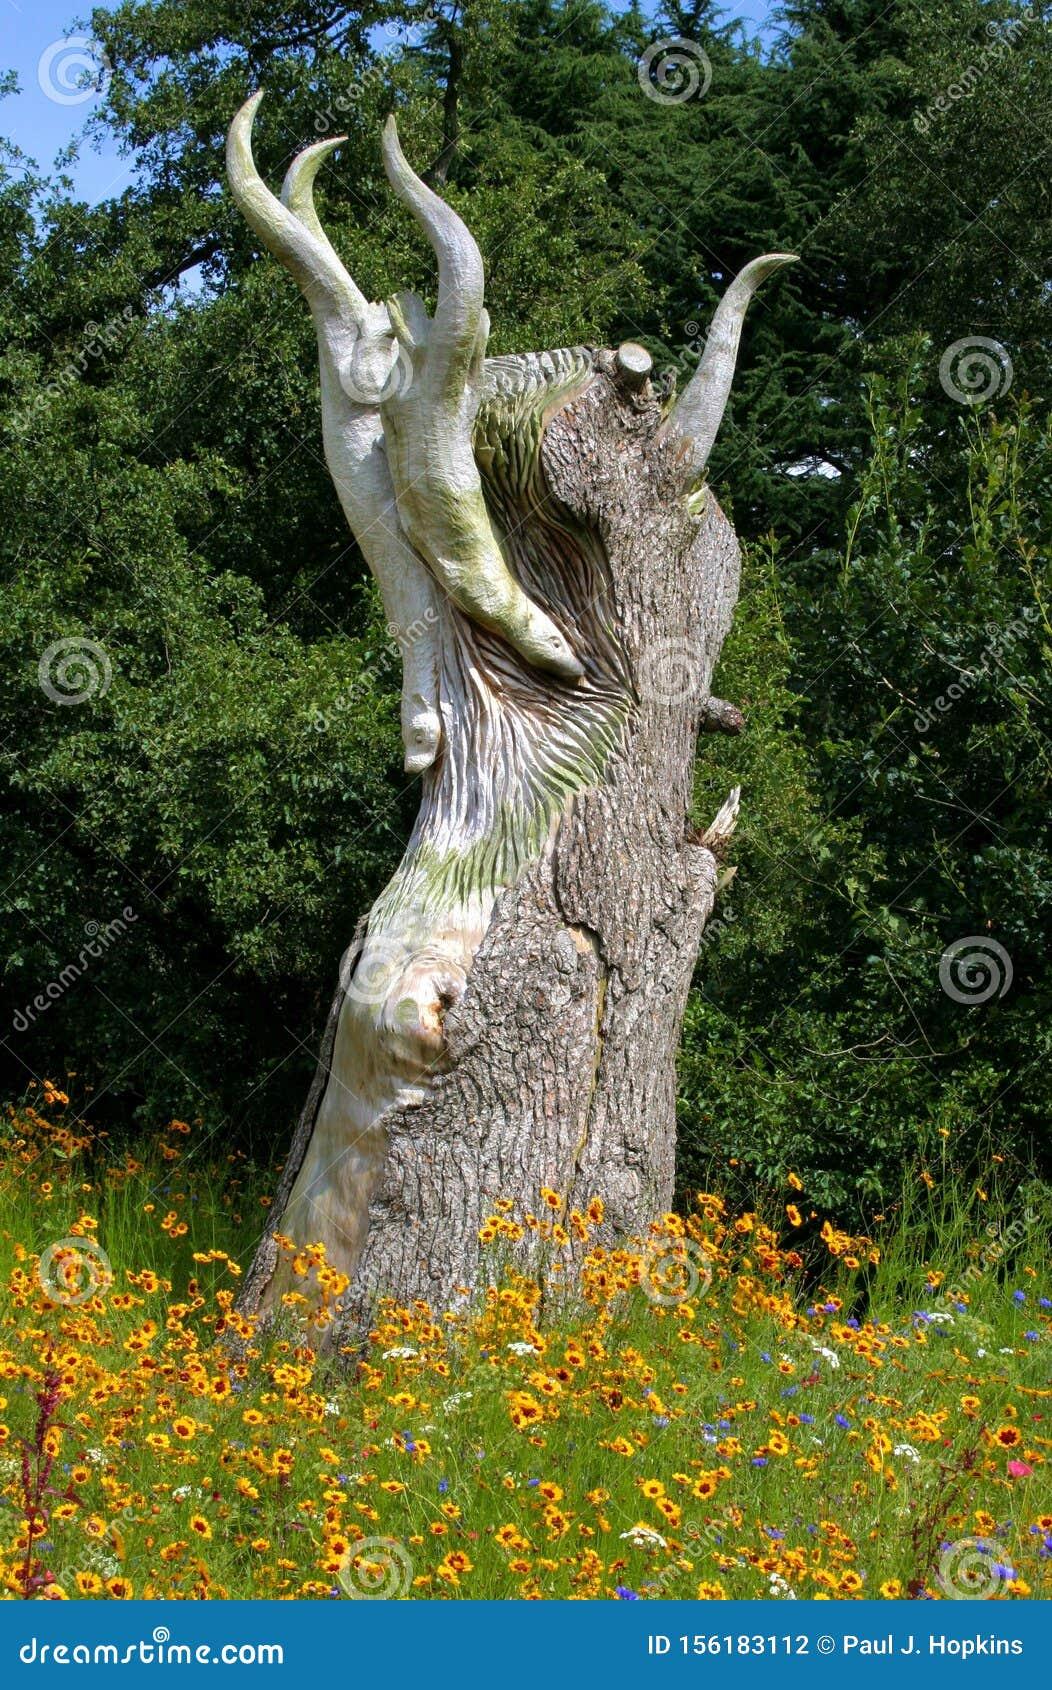 Felled Tree Trunk Carved Sculpture at Trentham Estate